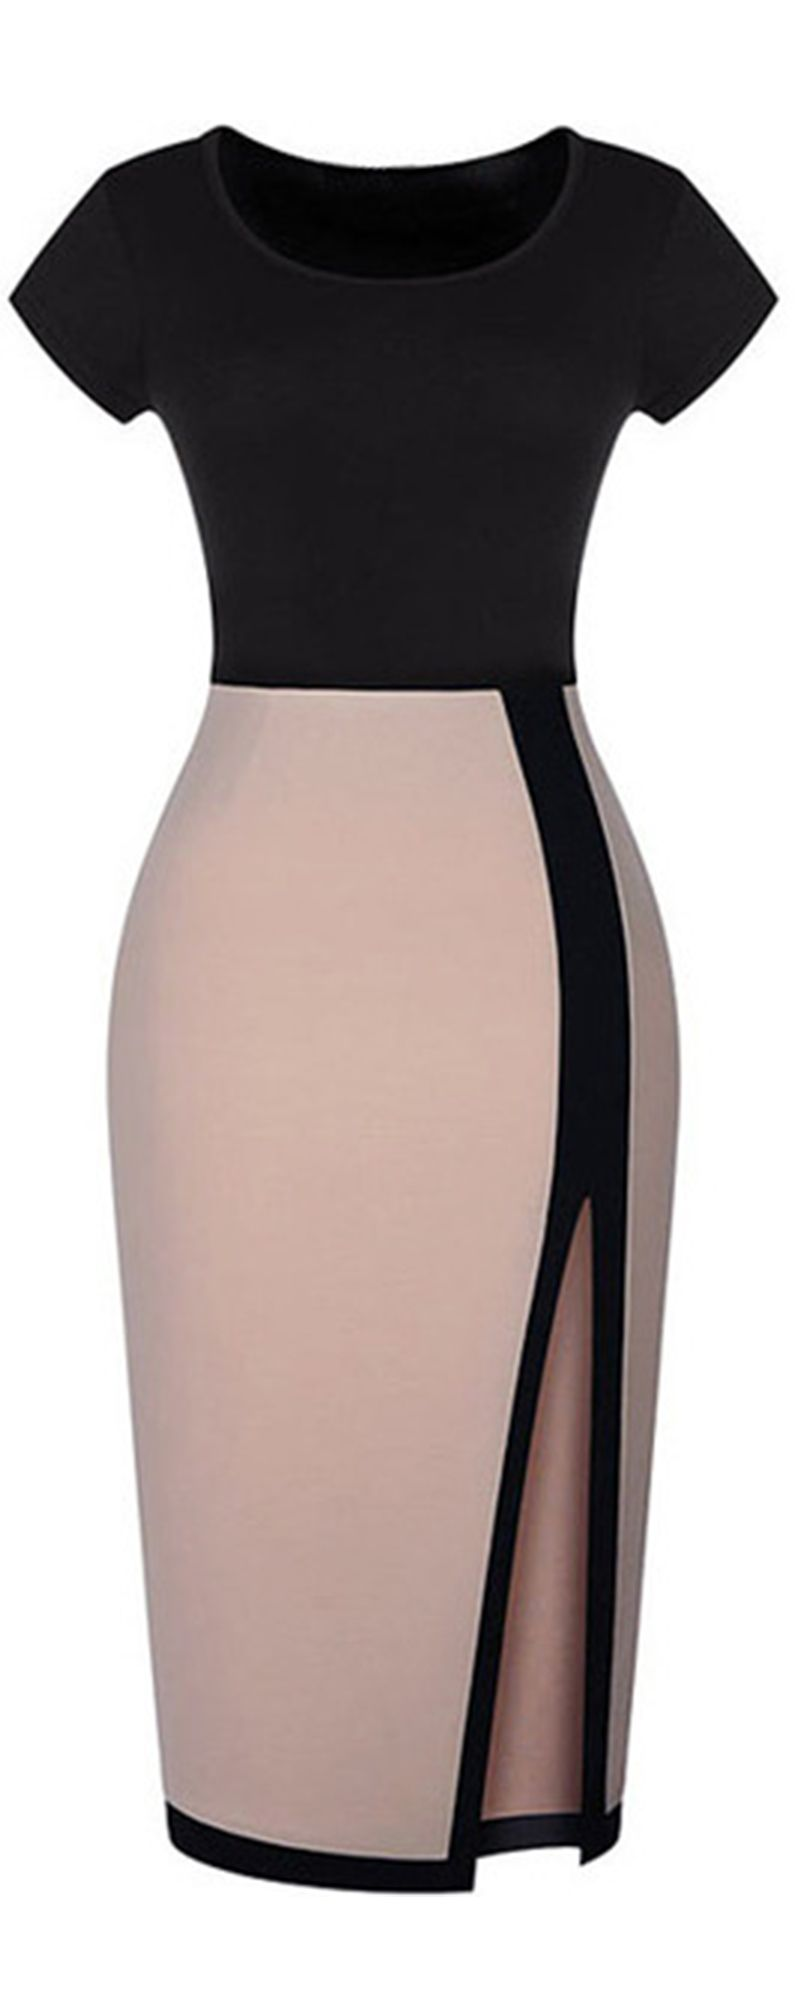 vestido largo | Vestidos | Pinterest | Trajes de vestir, Vestido ...